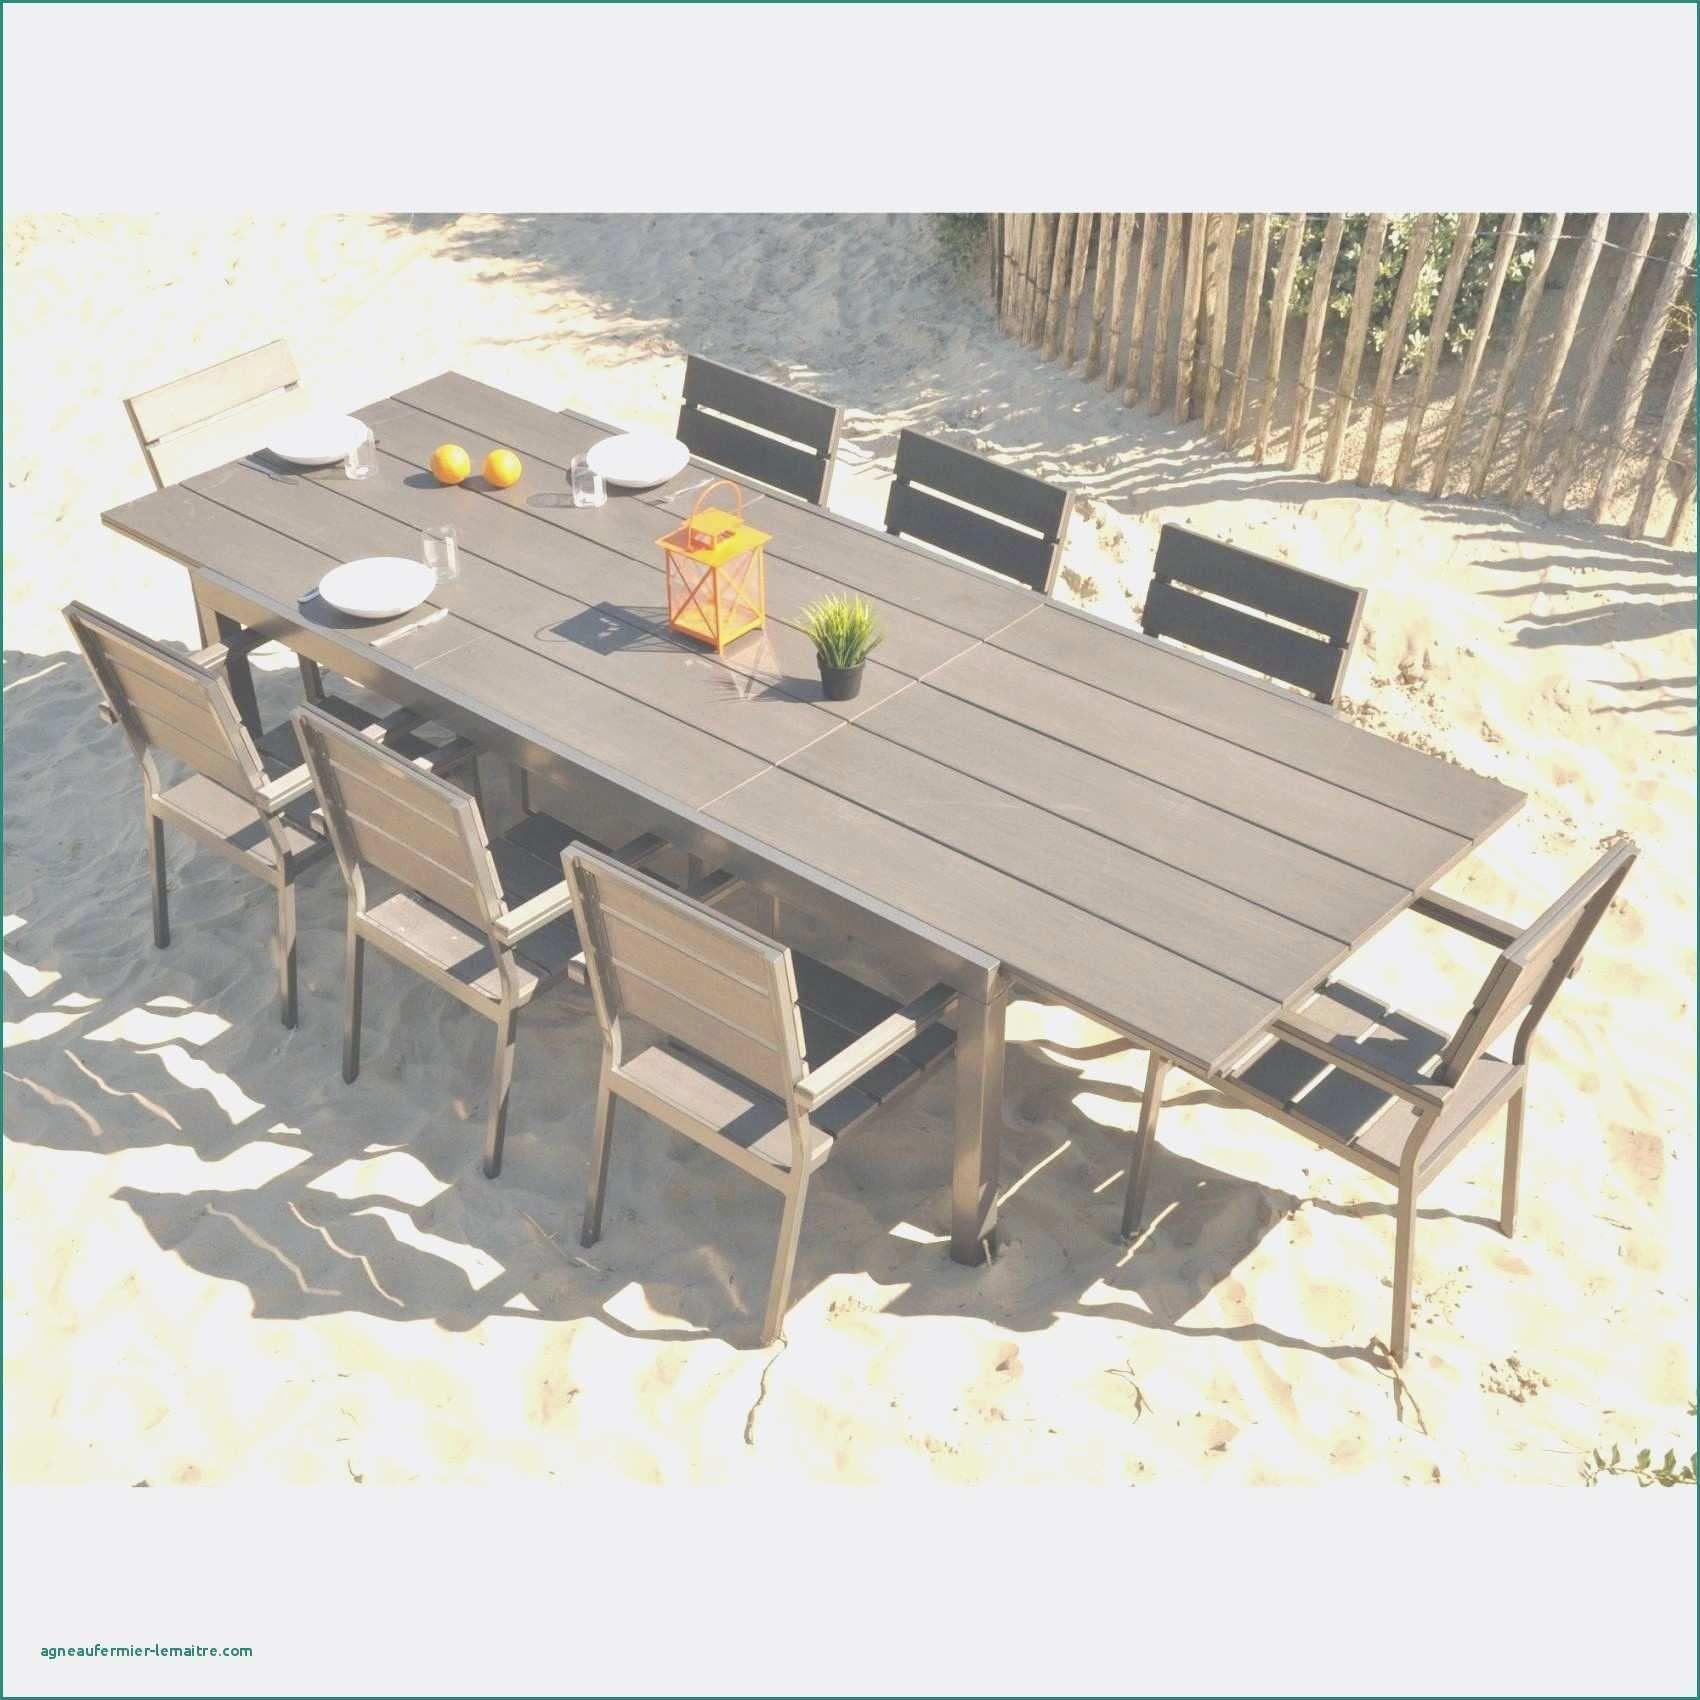 mobilier jardin castorama genial table et chaise de jardin castorama etonnant table teck de mobilier jardin castorama